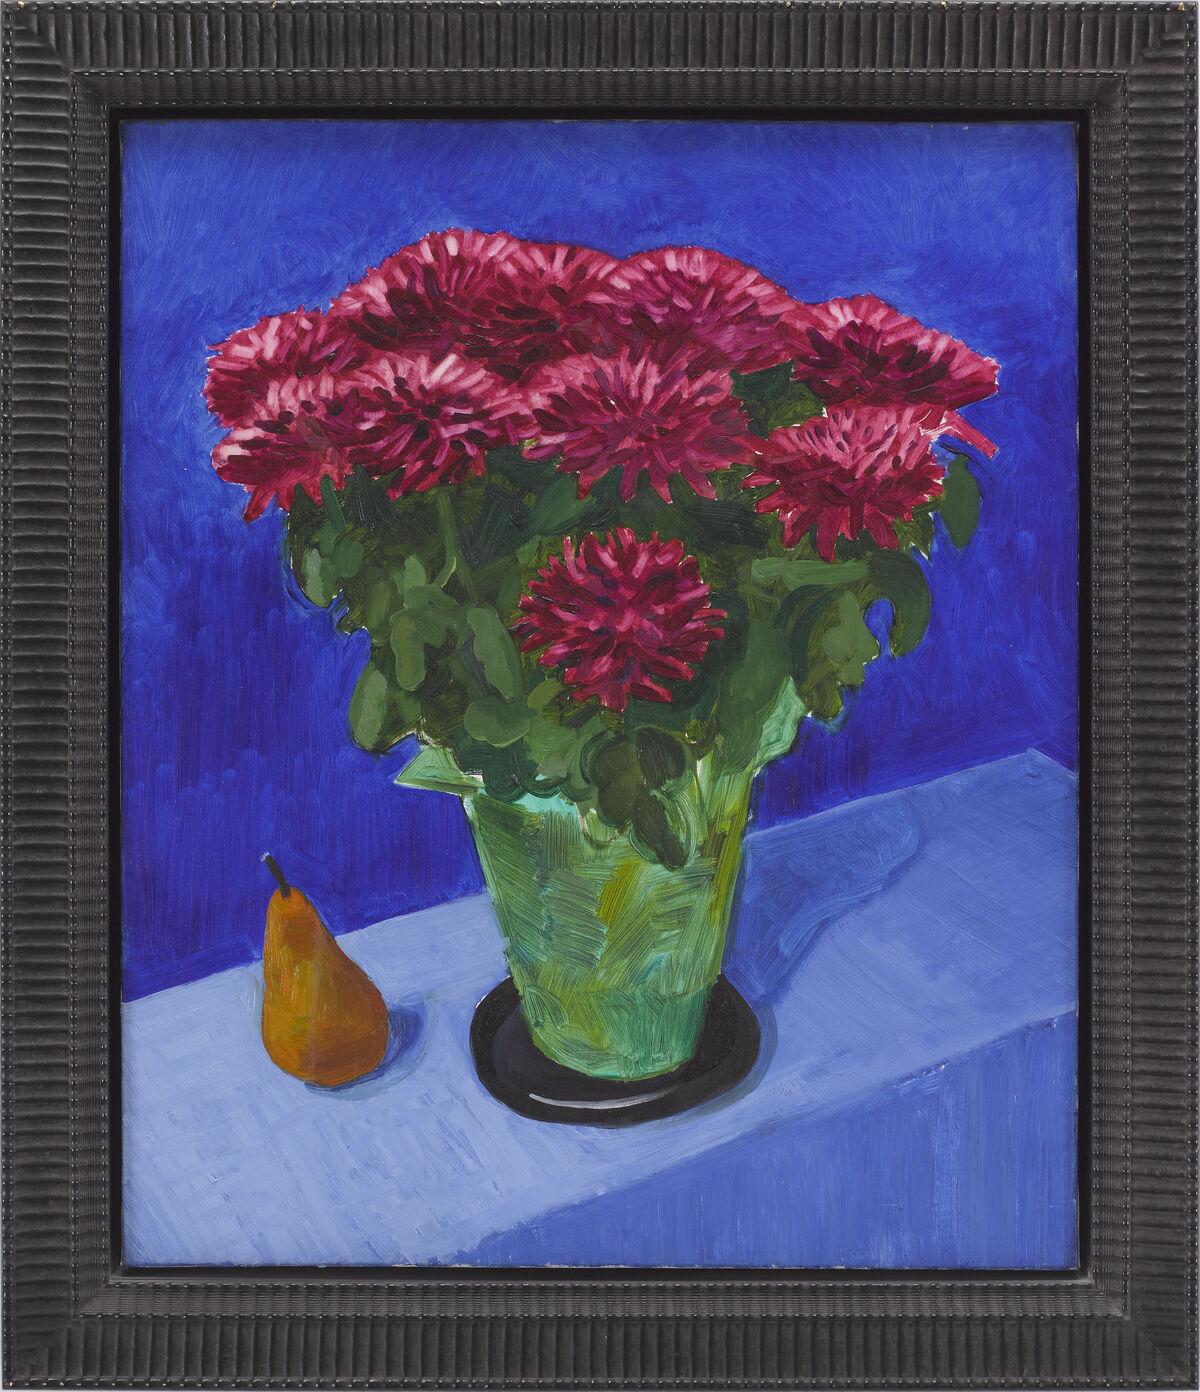 David Hockney, Chrysanthemums, 1996. Courtesy of Pace Gallery.